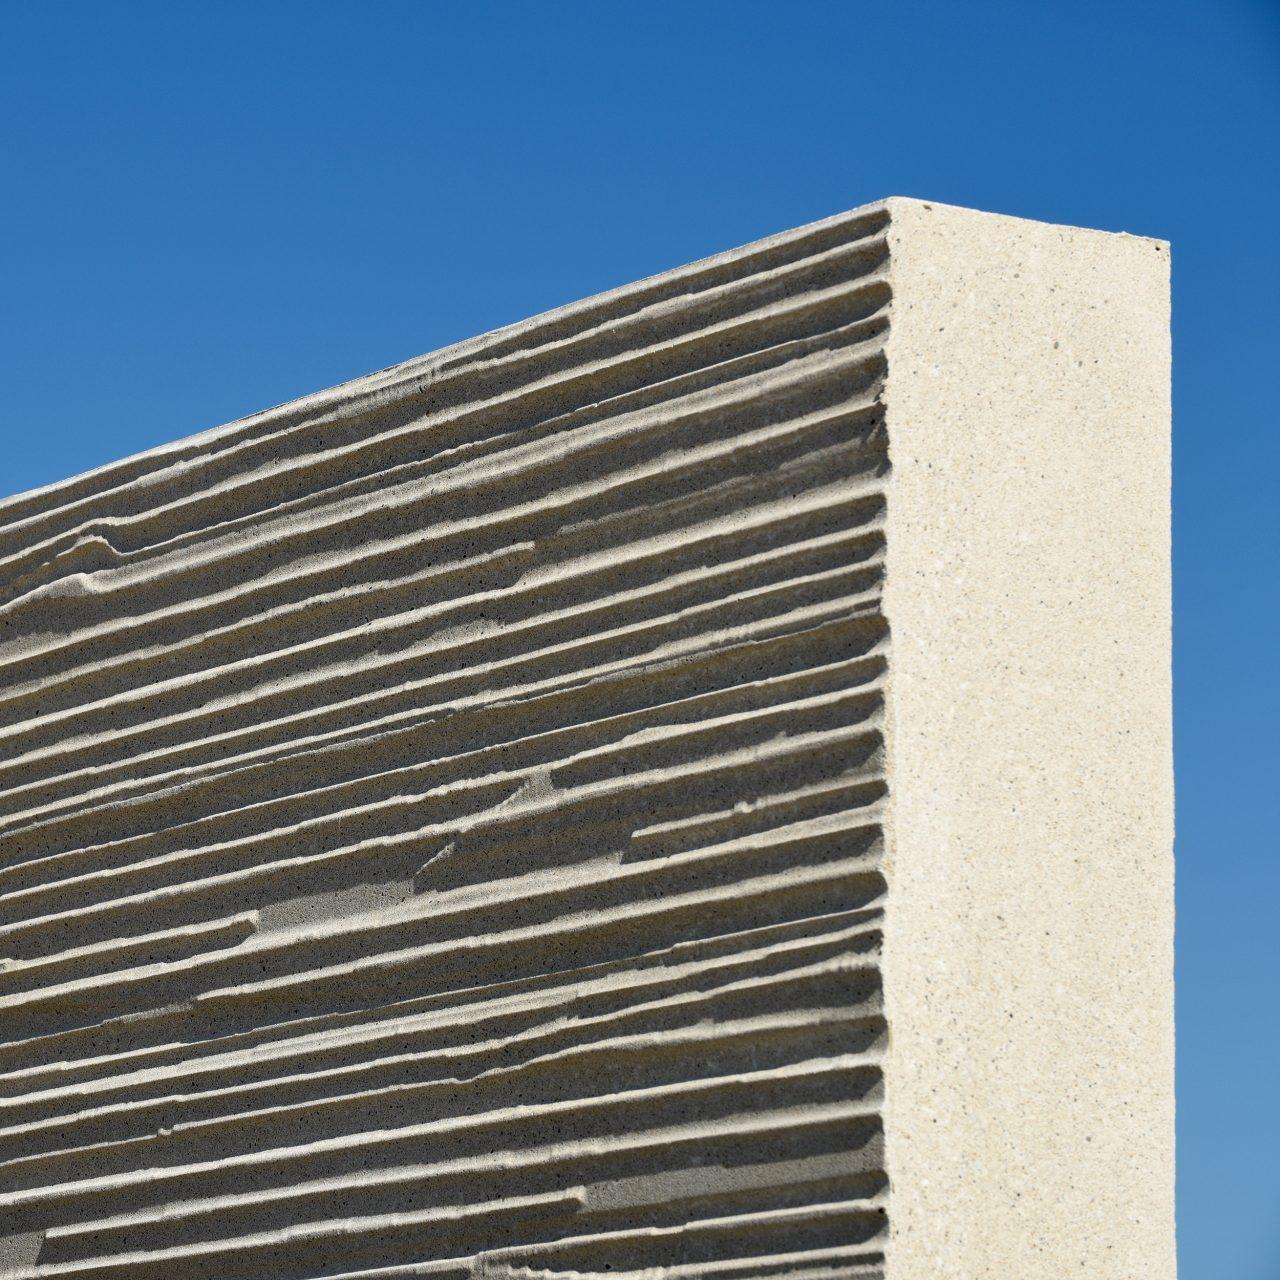 hoenninger architekturbeton oberflaeche